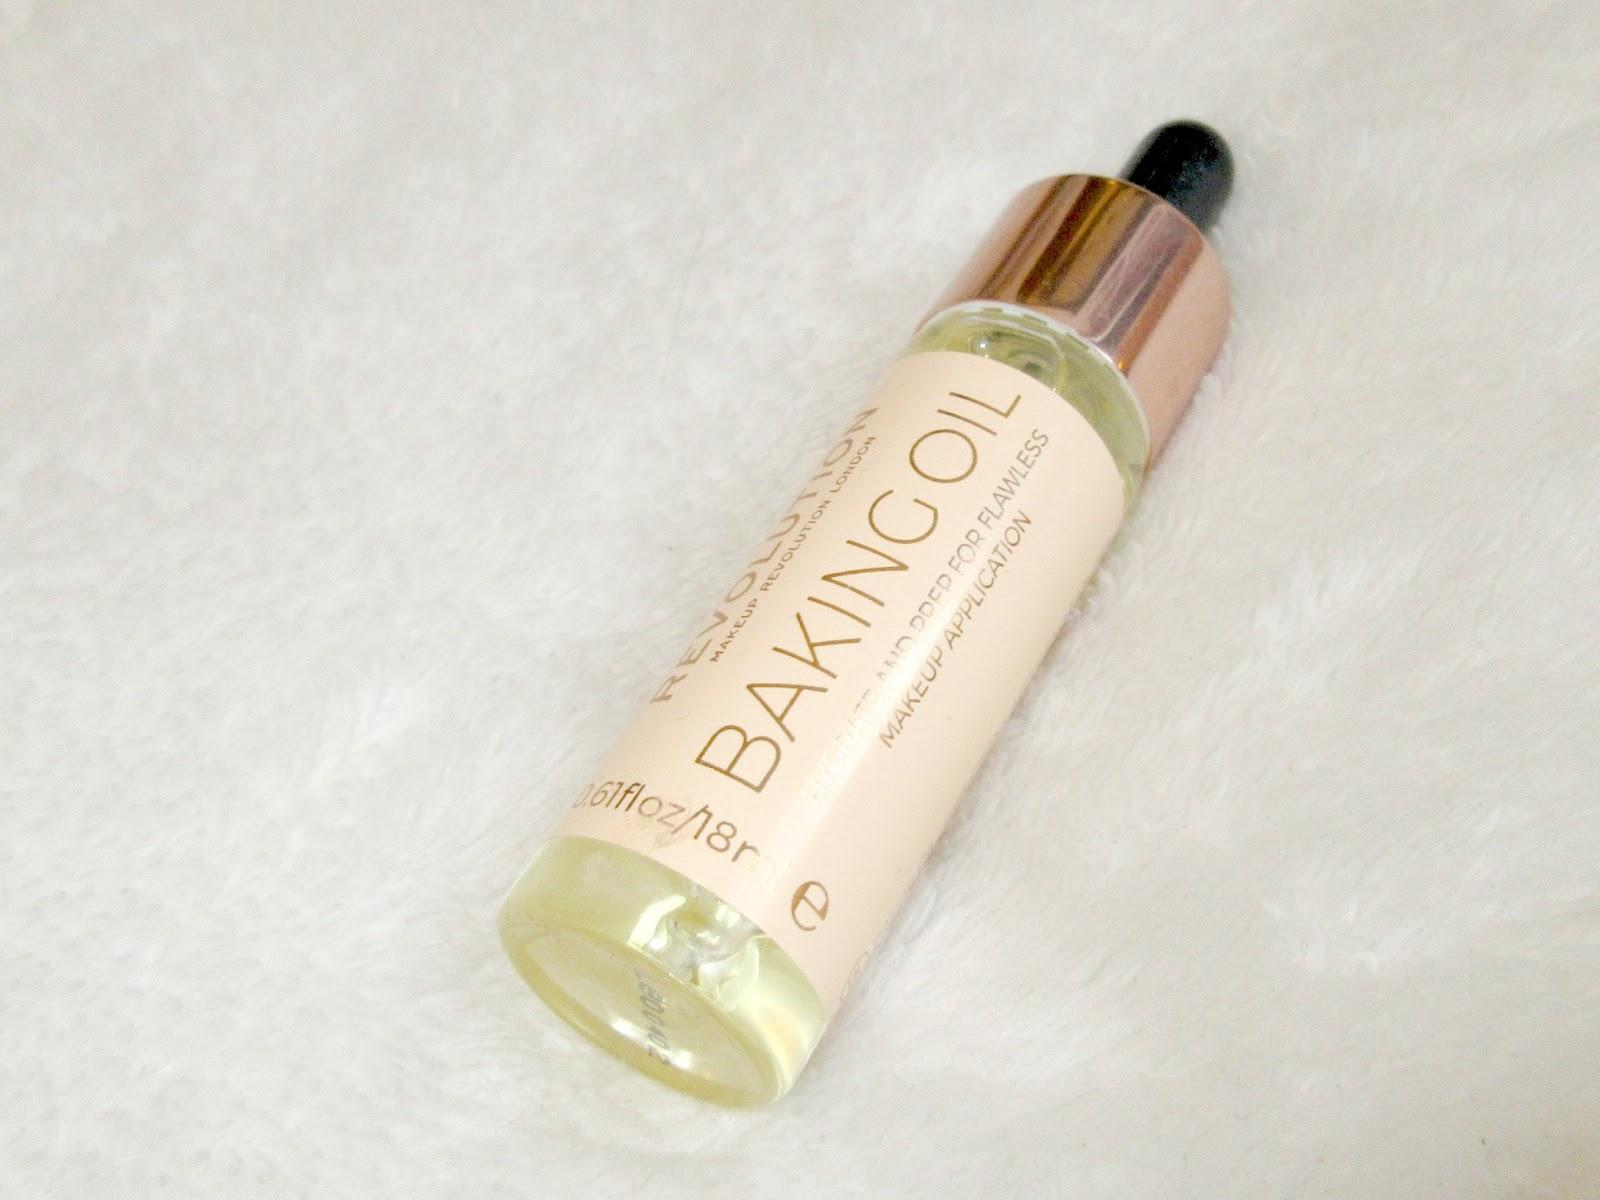 Makeup revolution baking oil